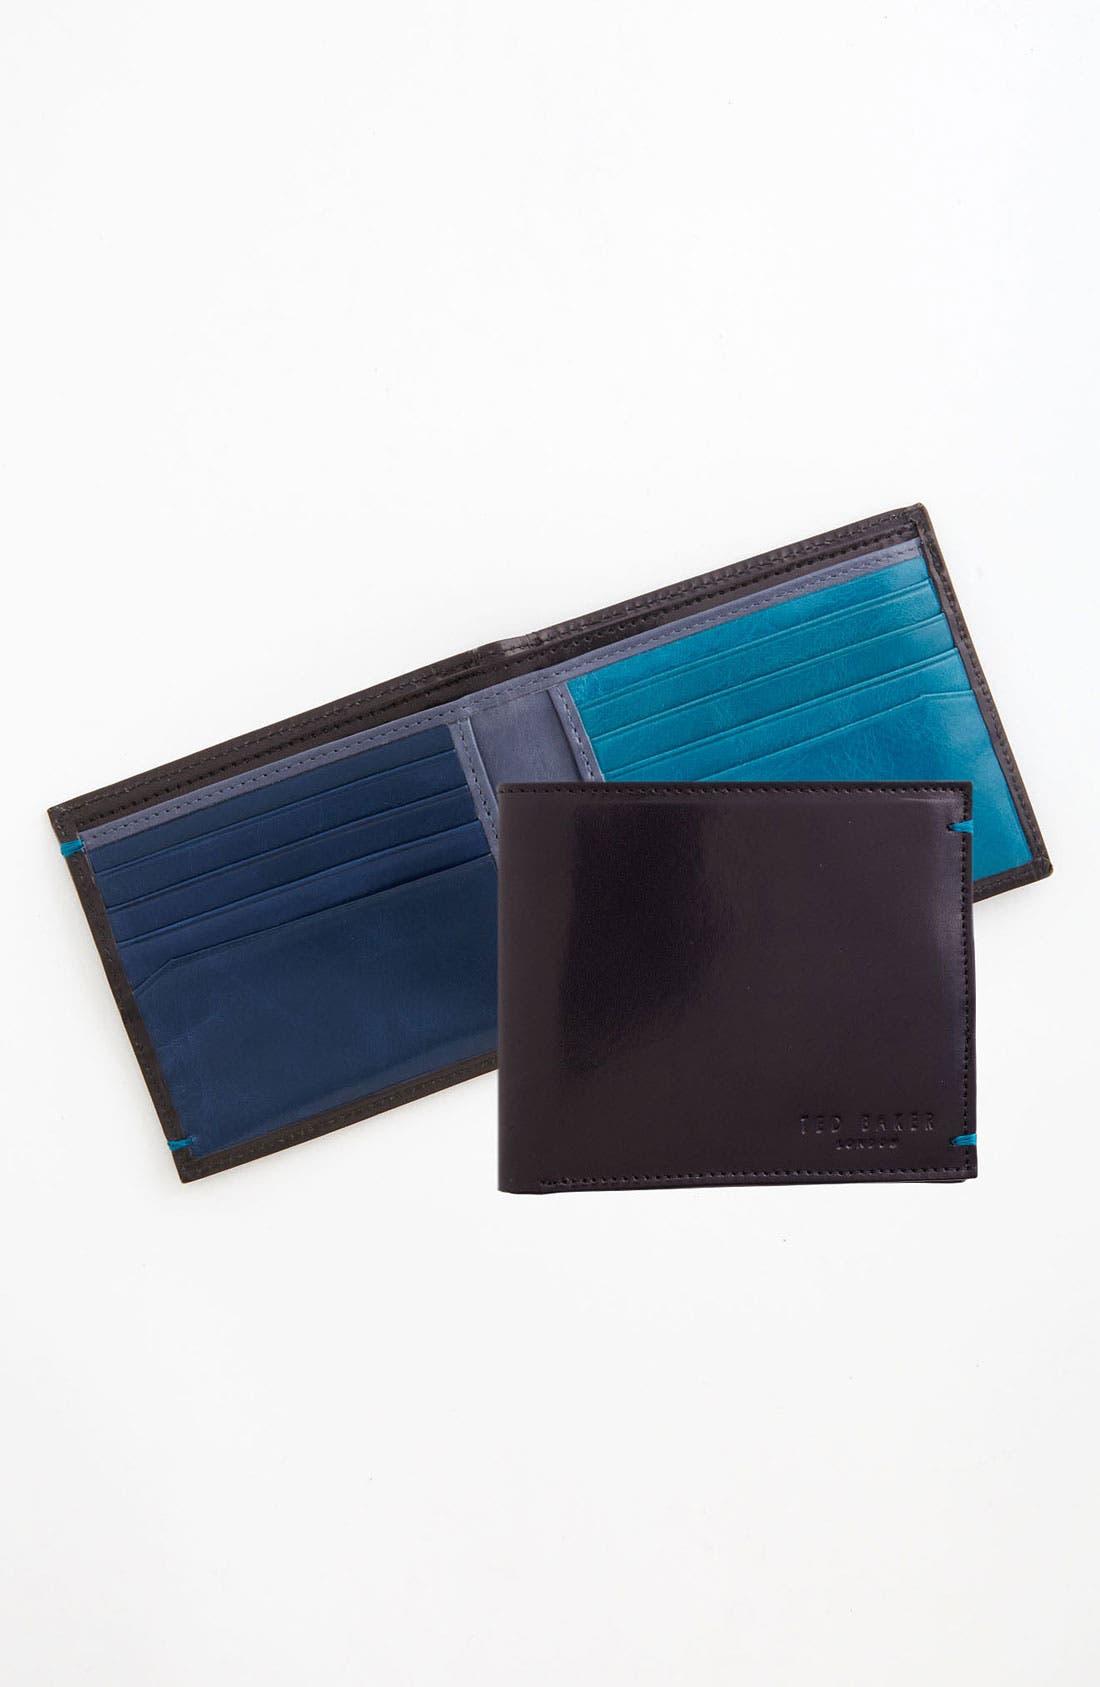 Main Image - Ted Baker London 'Bright' Wallet